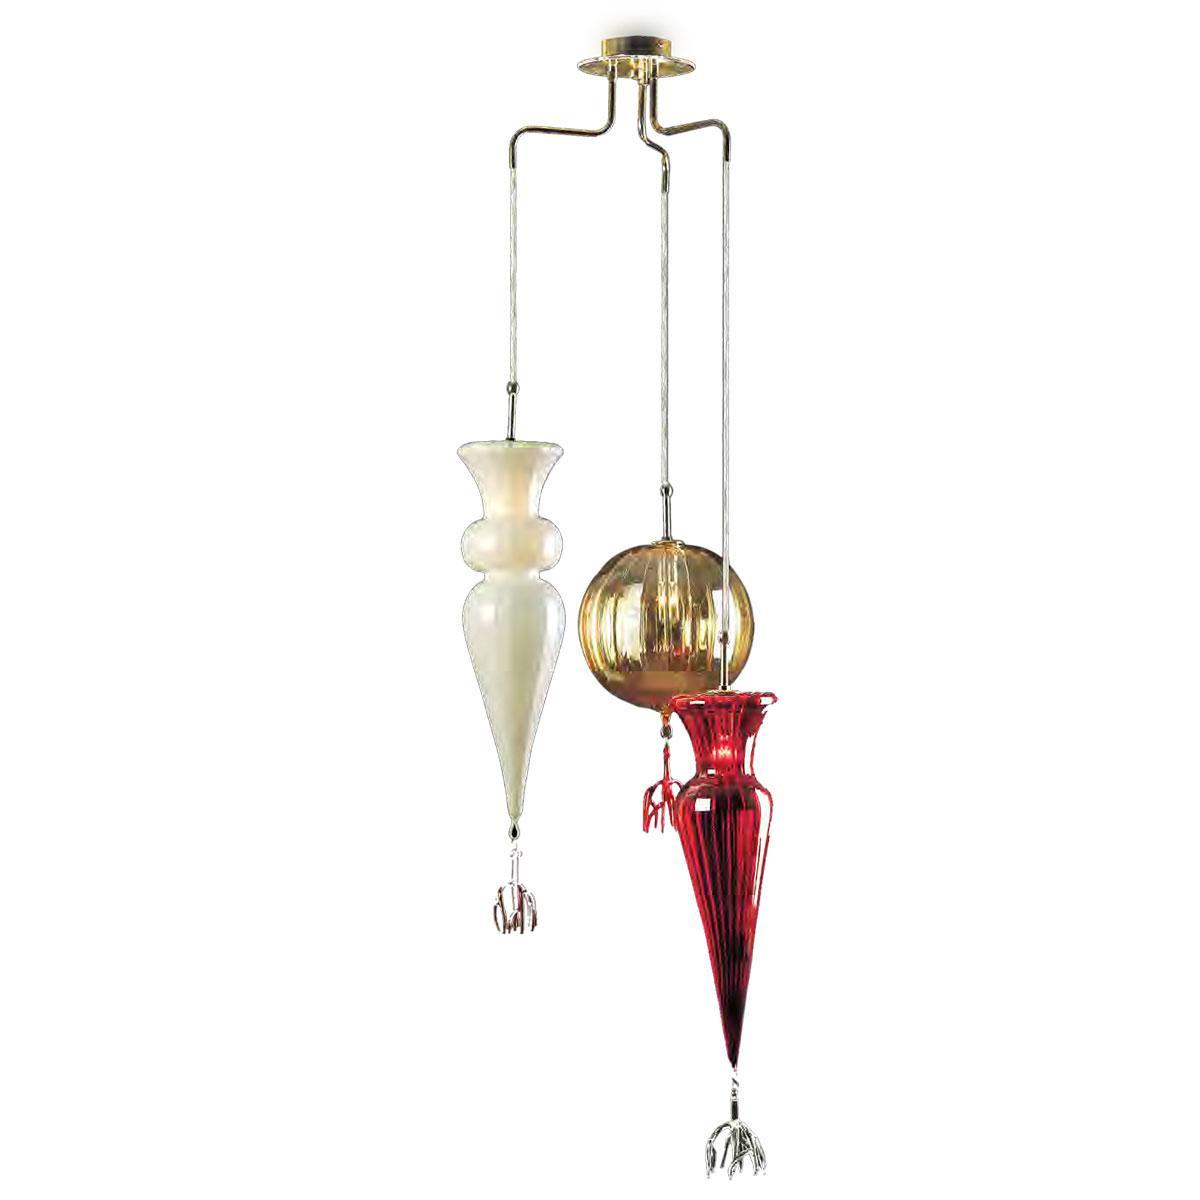 """Picca e Sfera"" lámpara colgante en cristal de Murano - 3 luces -"